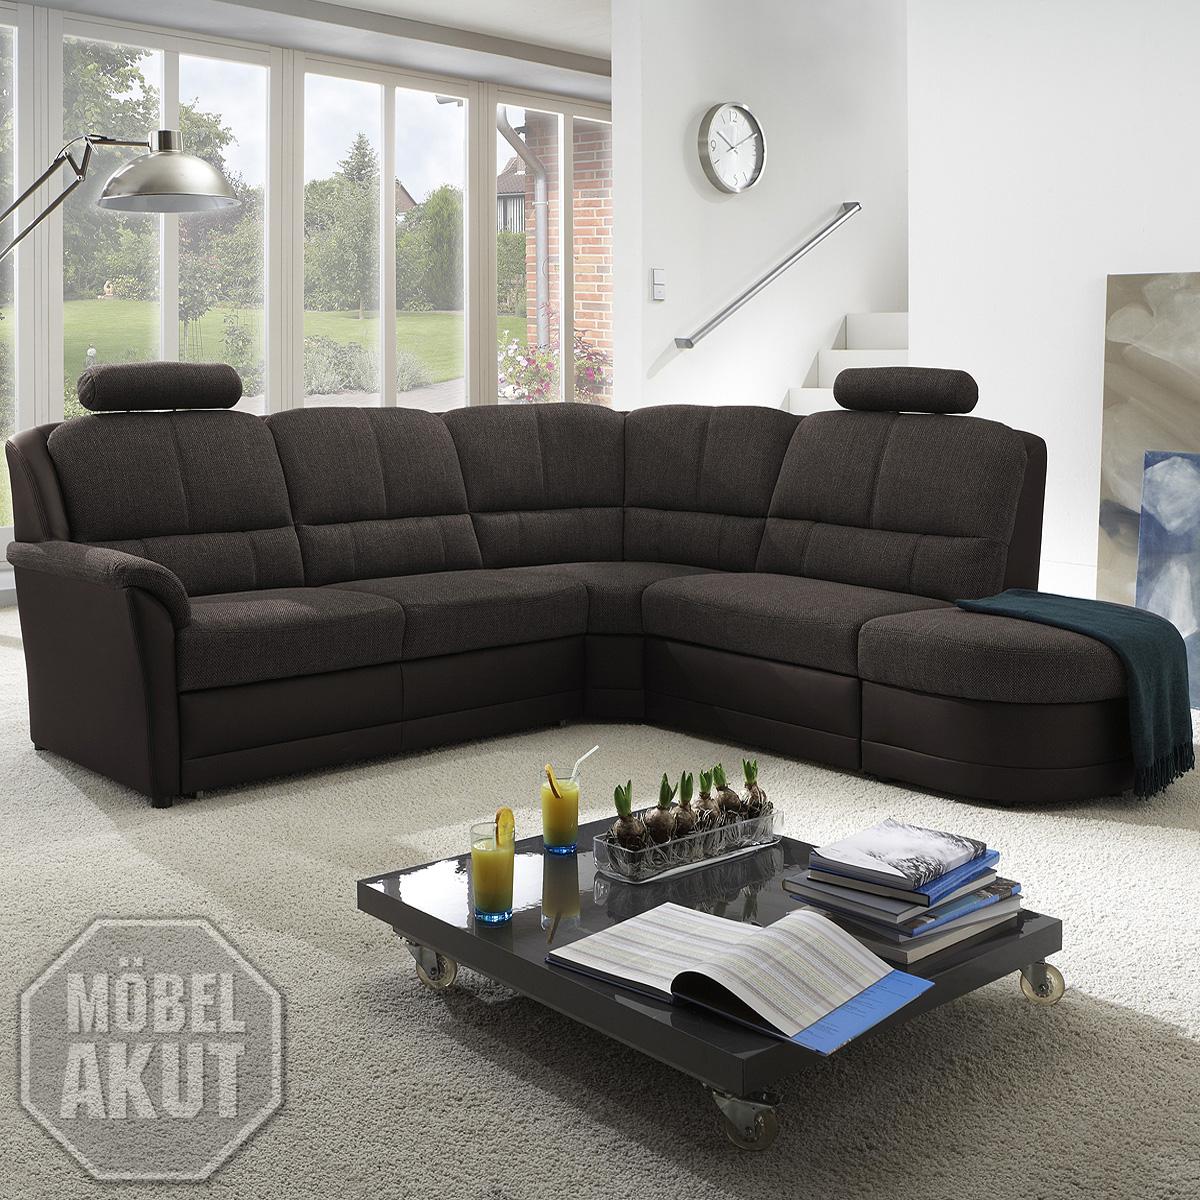 Wohnlandschaft mataro ecksofa eckgarnitur sofa nougat for Wohnlandschaft braun